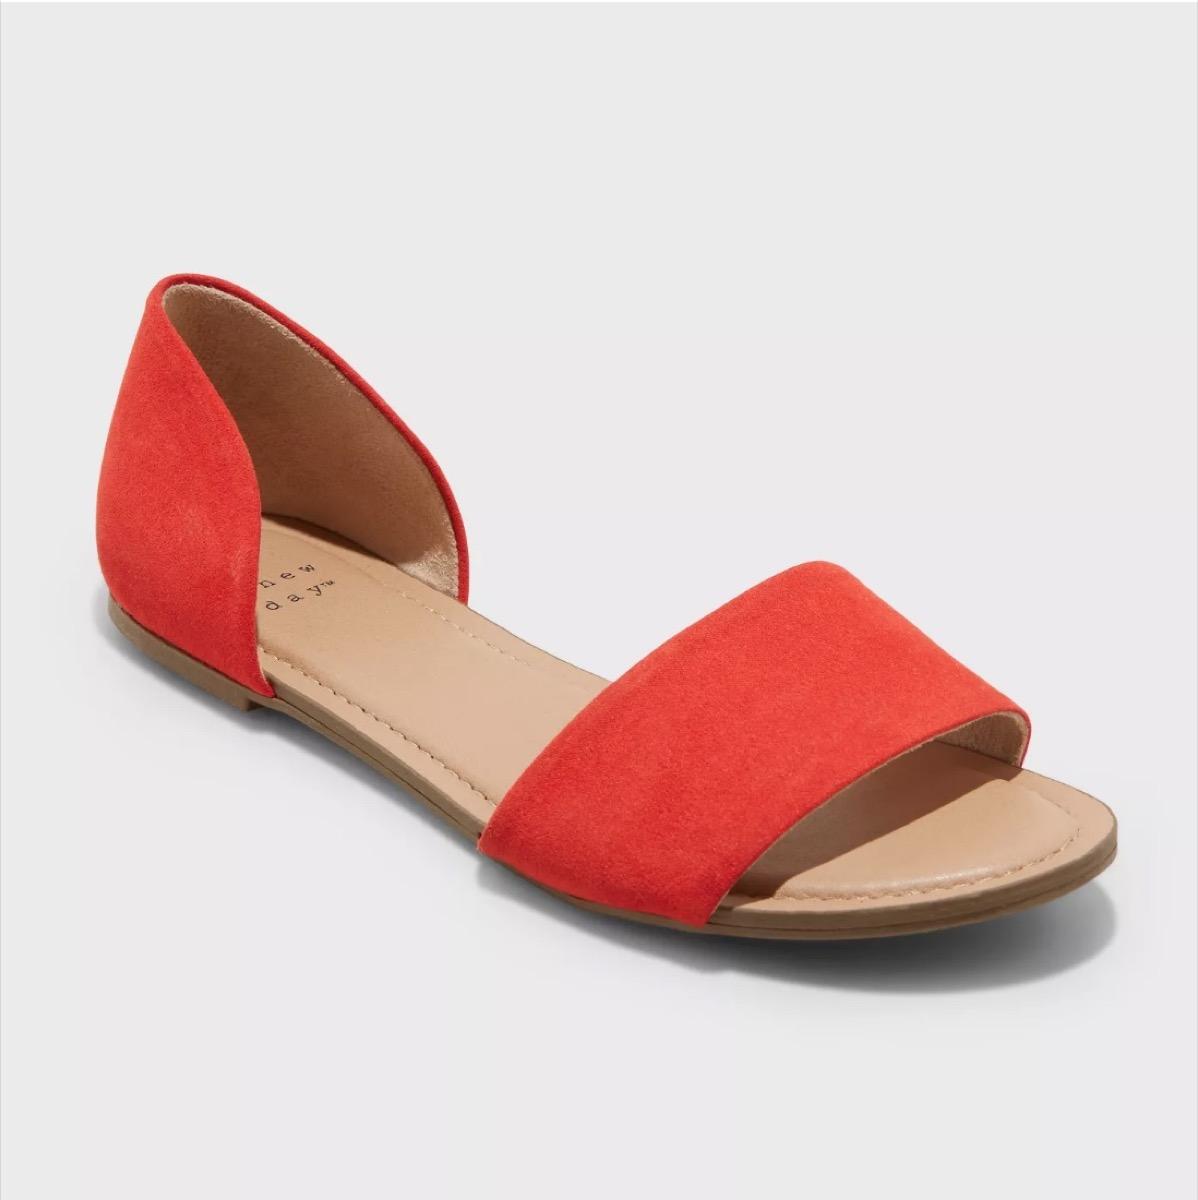 red sandals, affordable sandals